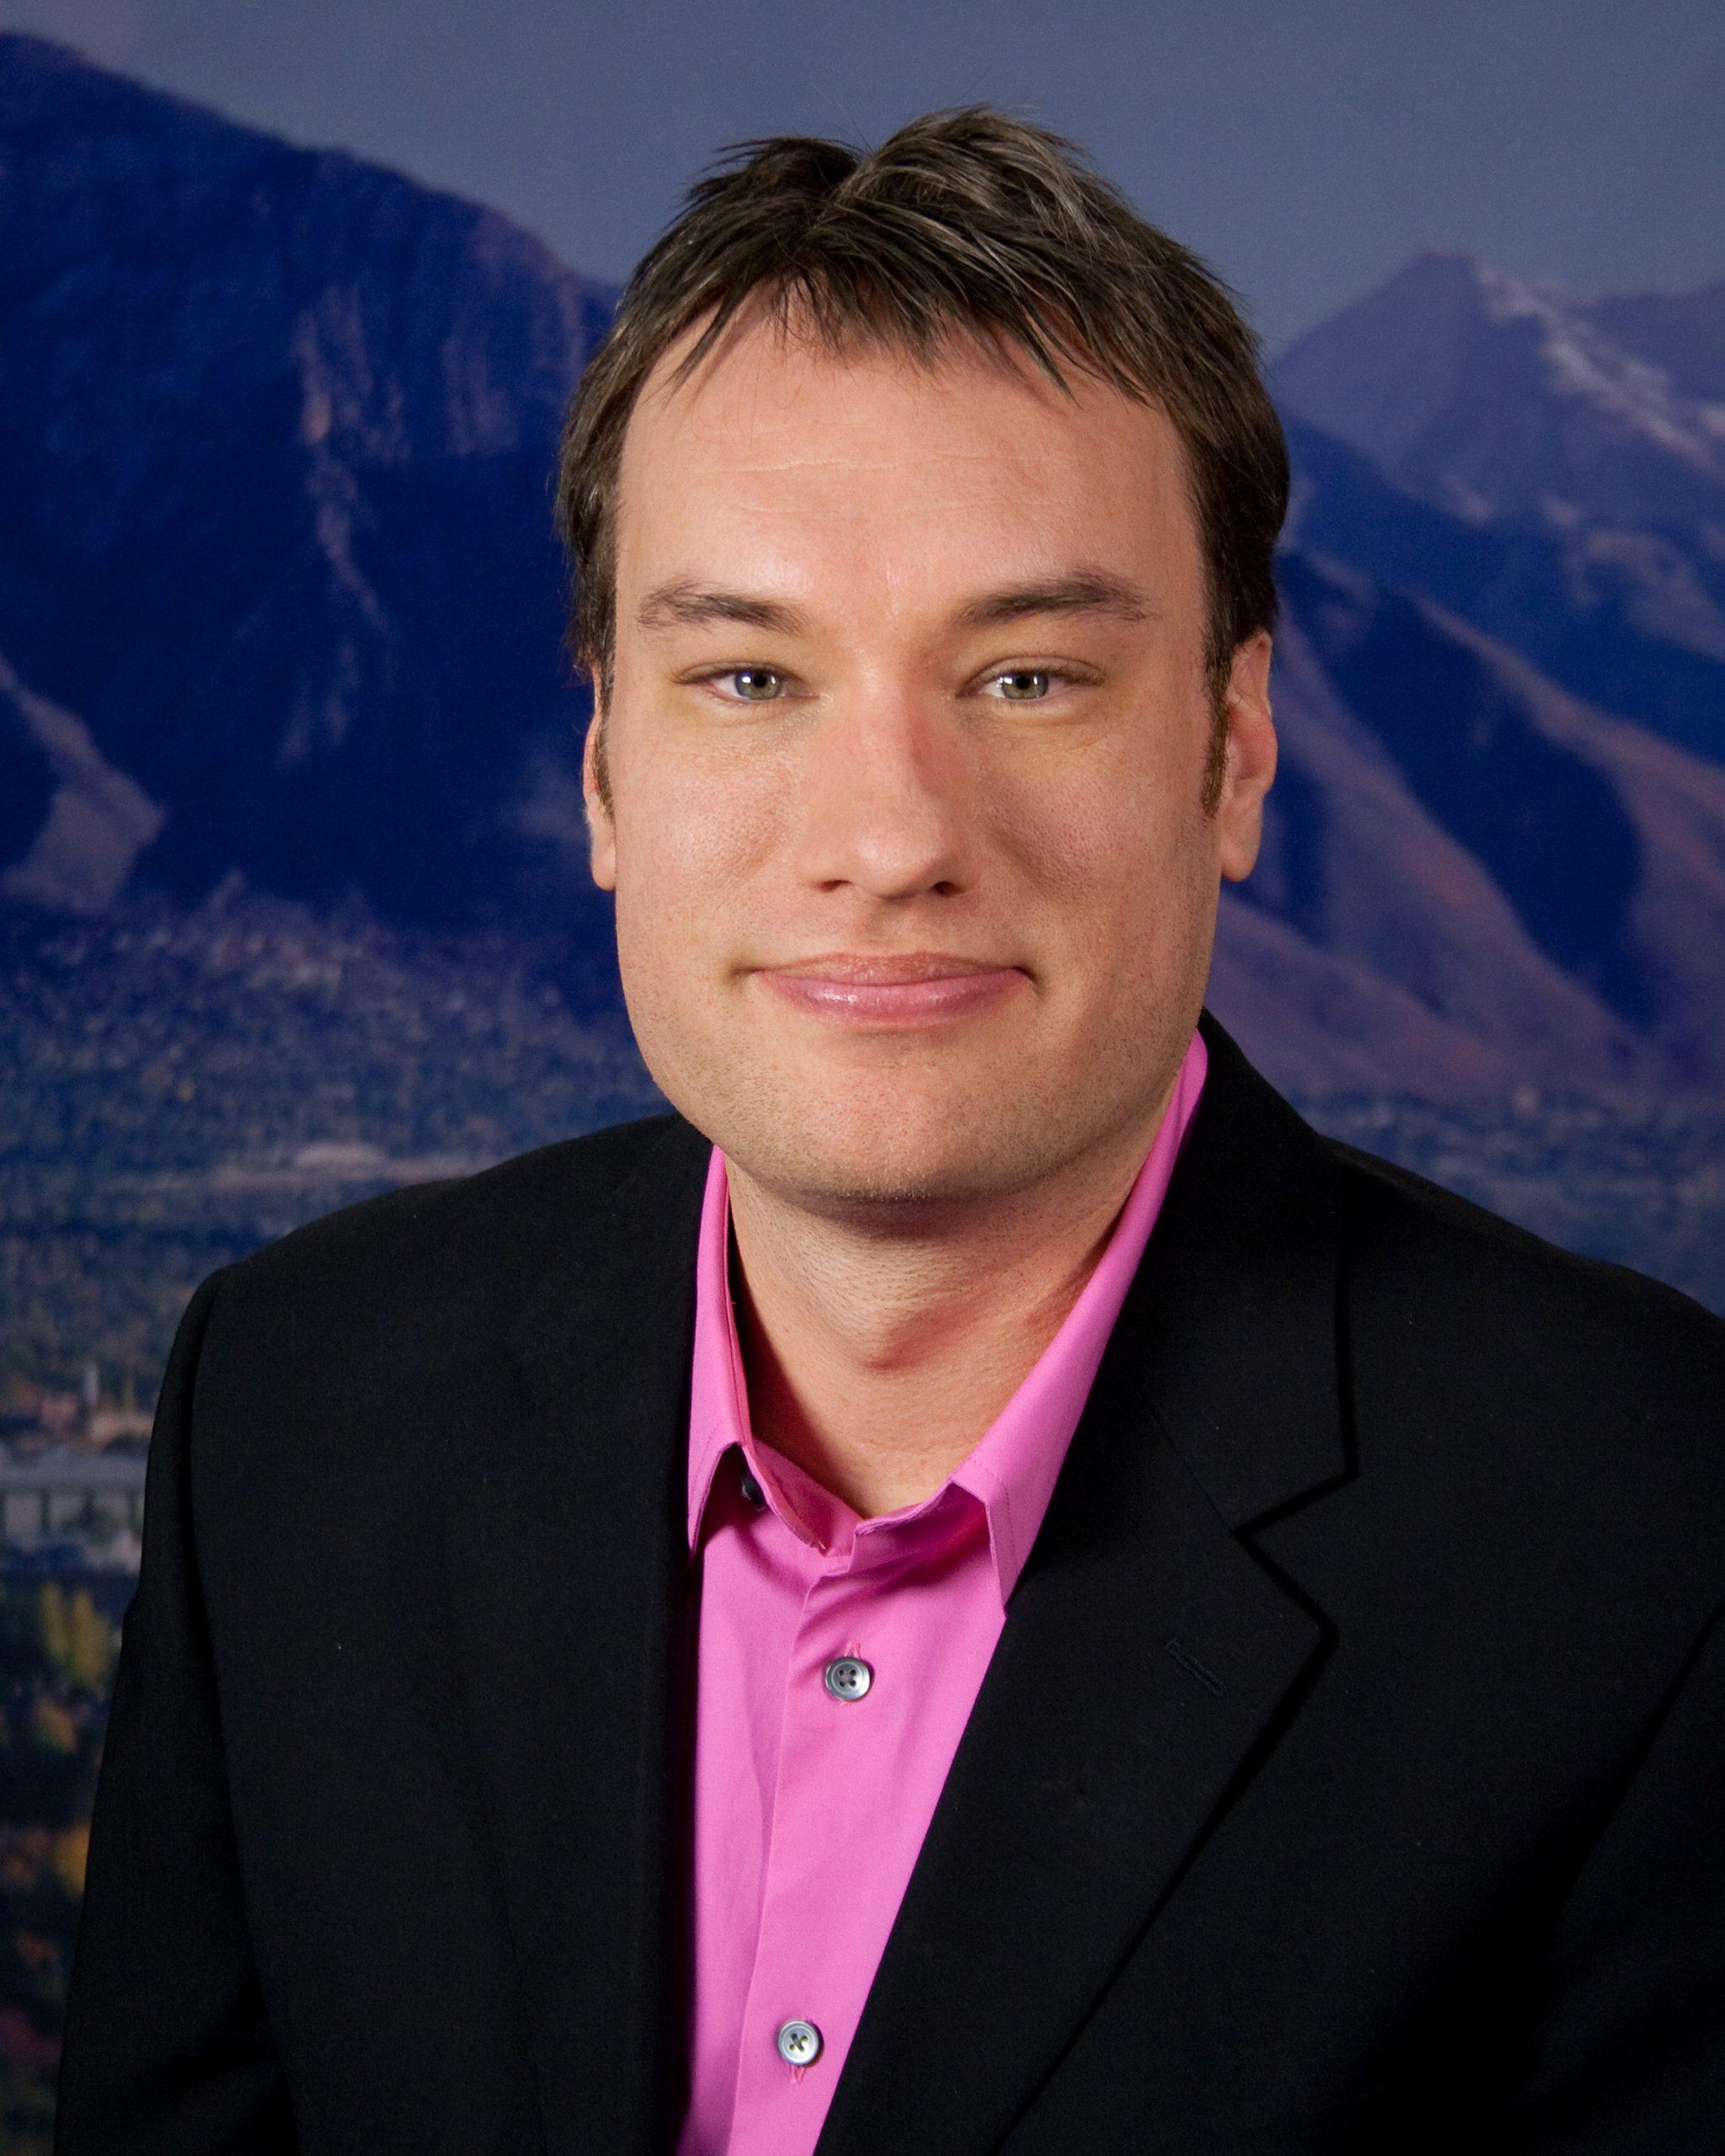 New University of Utah Communications Director, Keith Sterling.